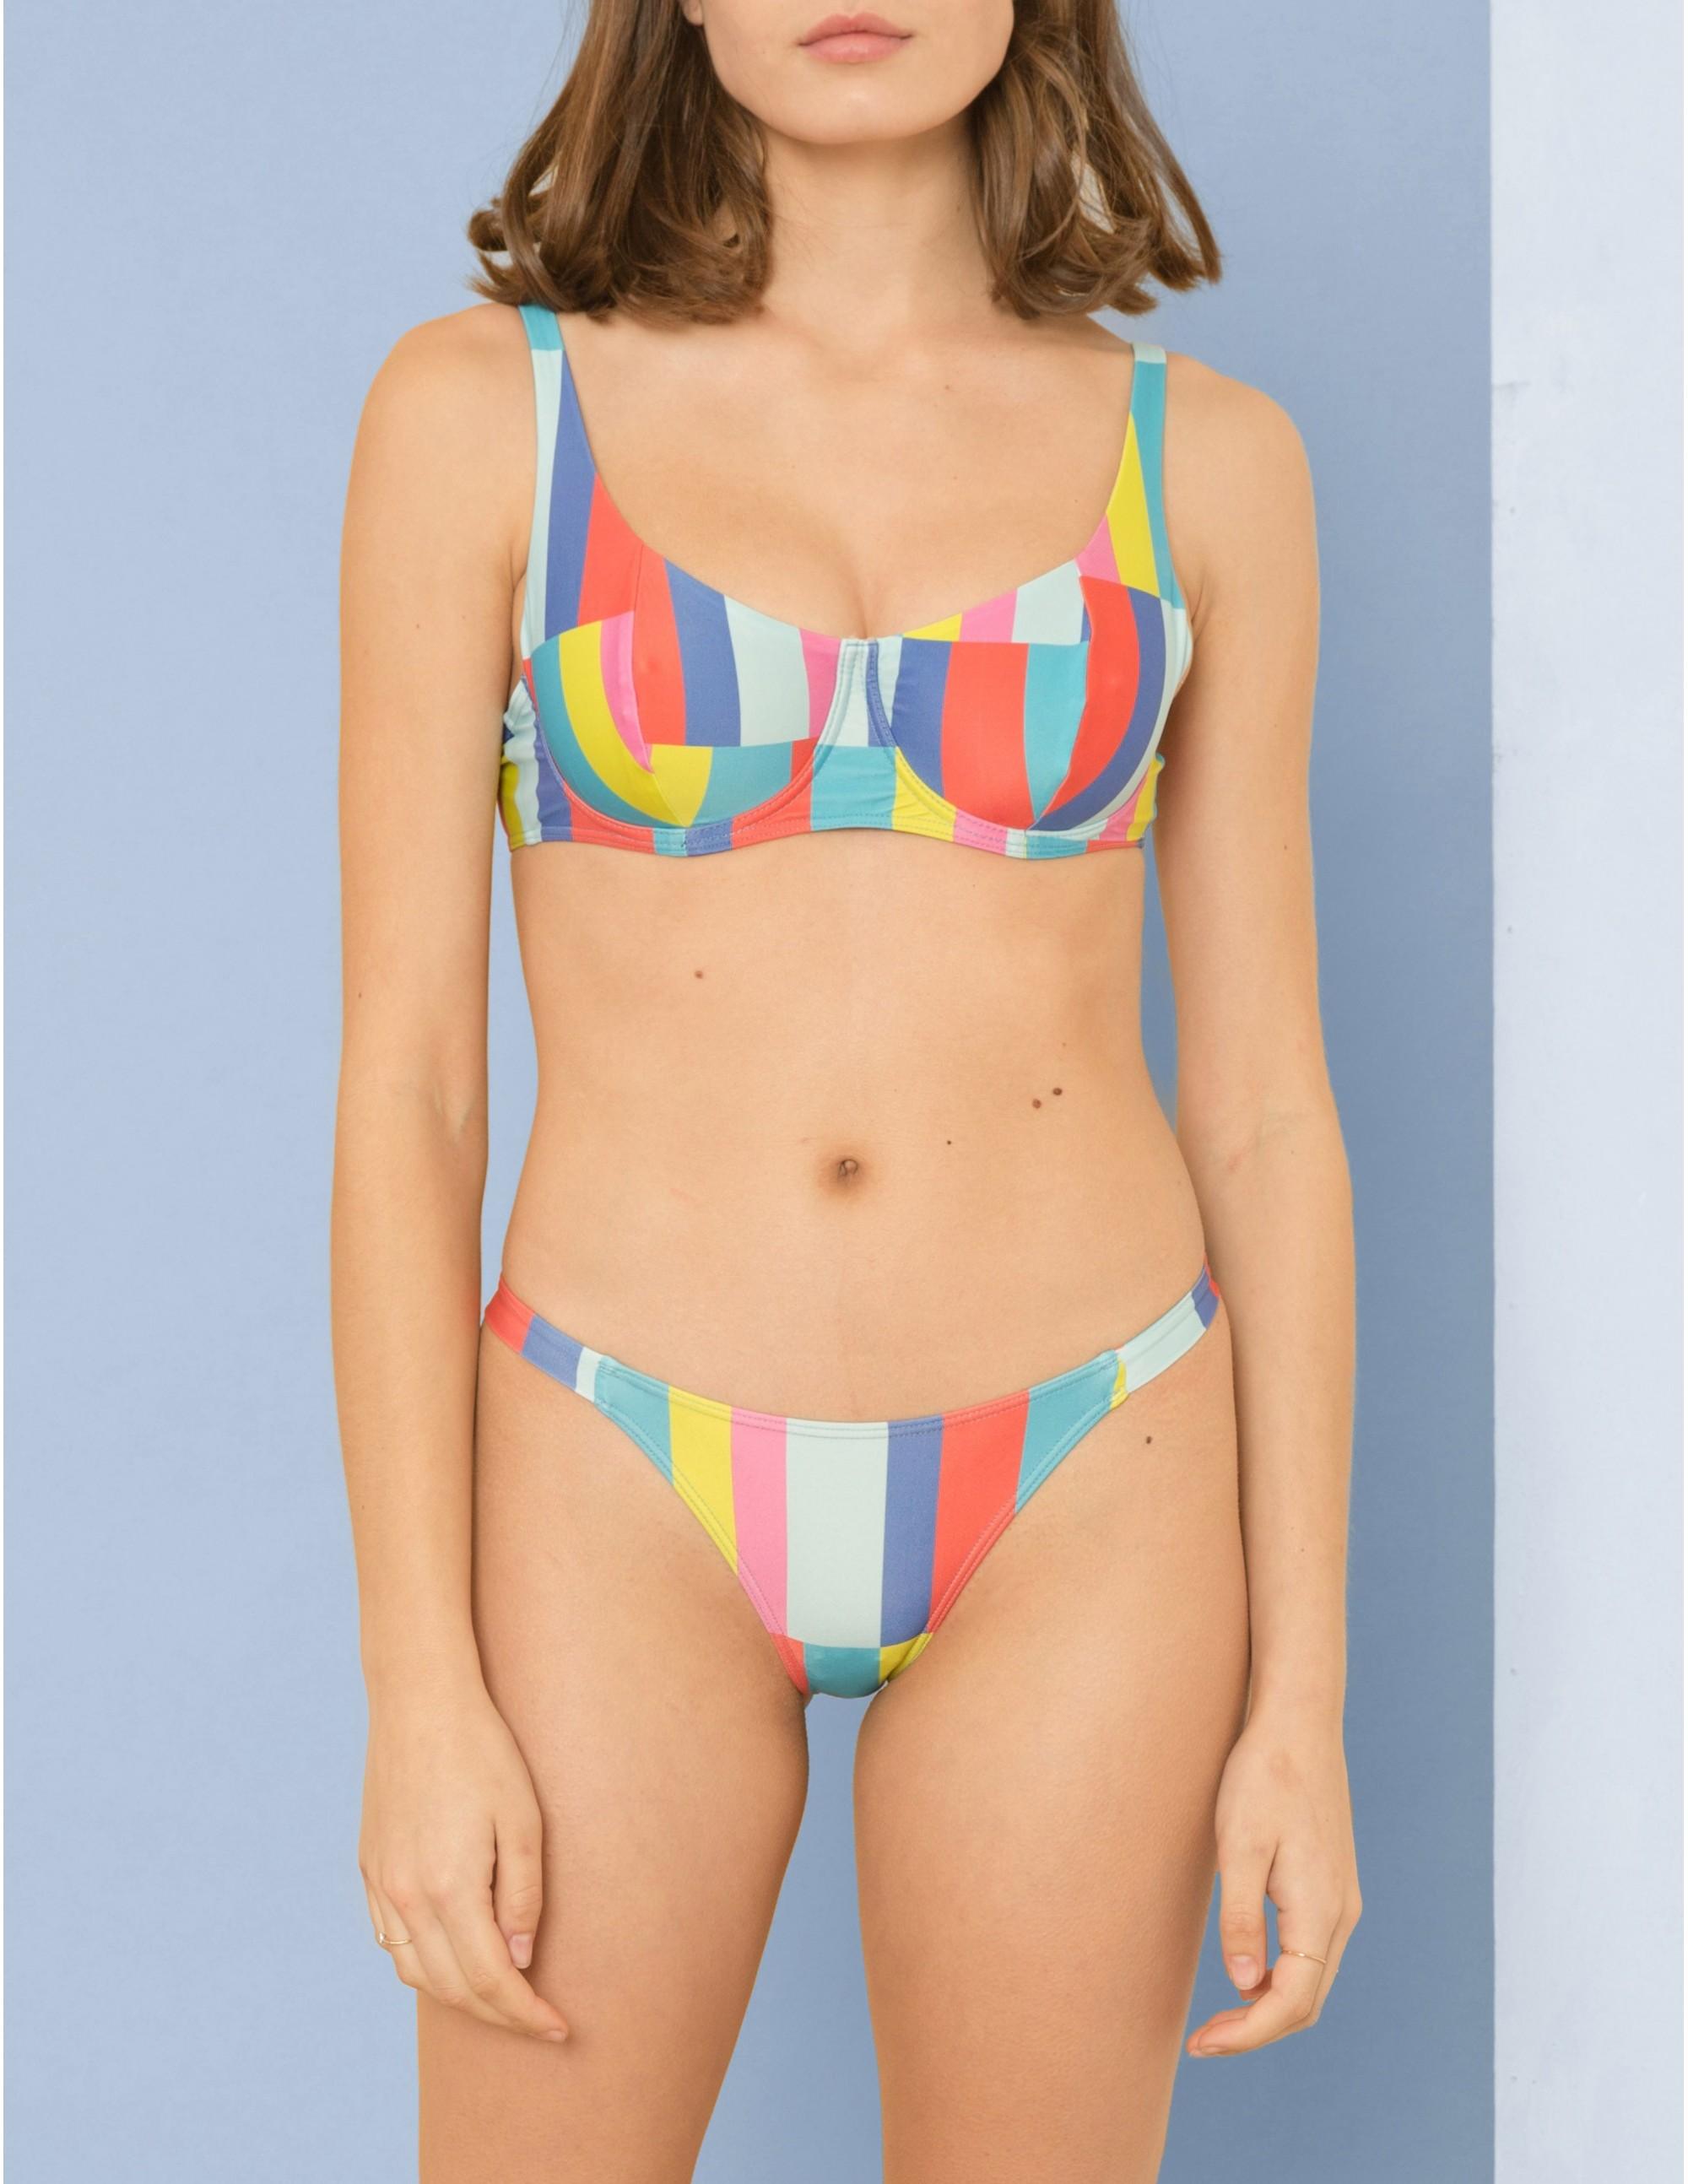 KIGO bikini top - CRAZY MORNING